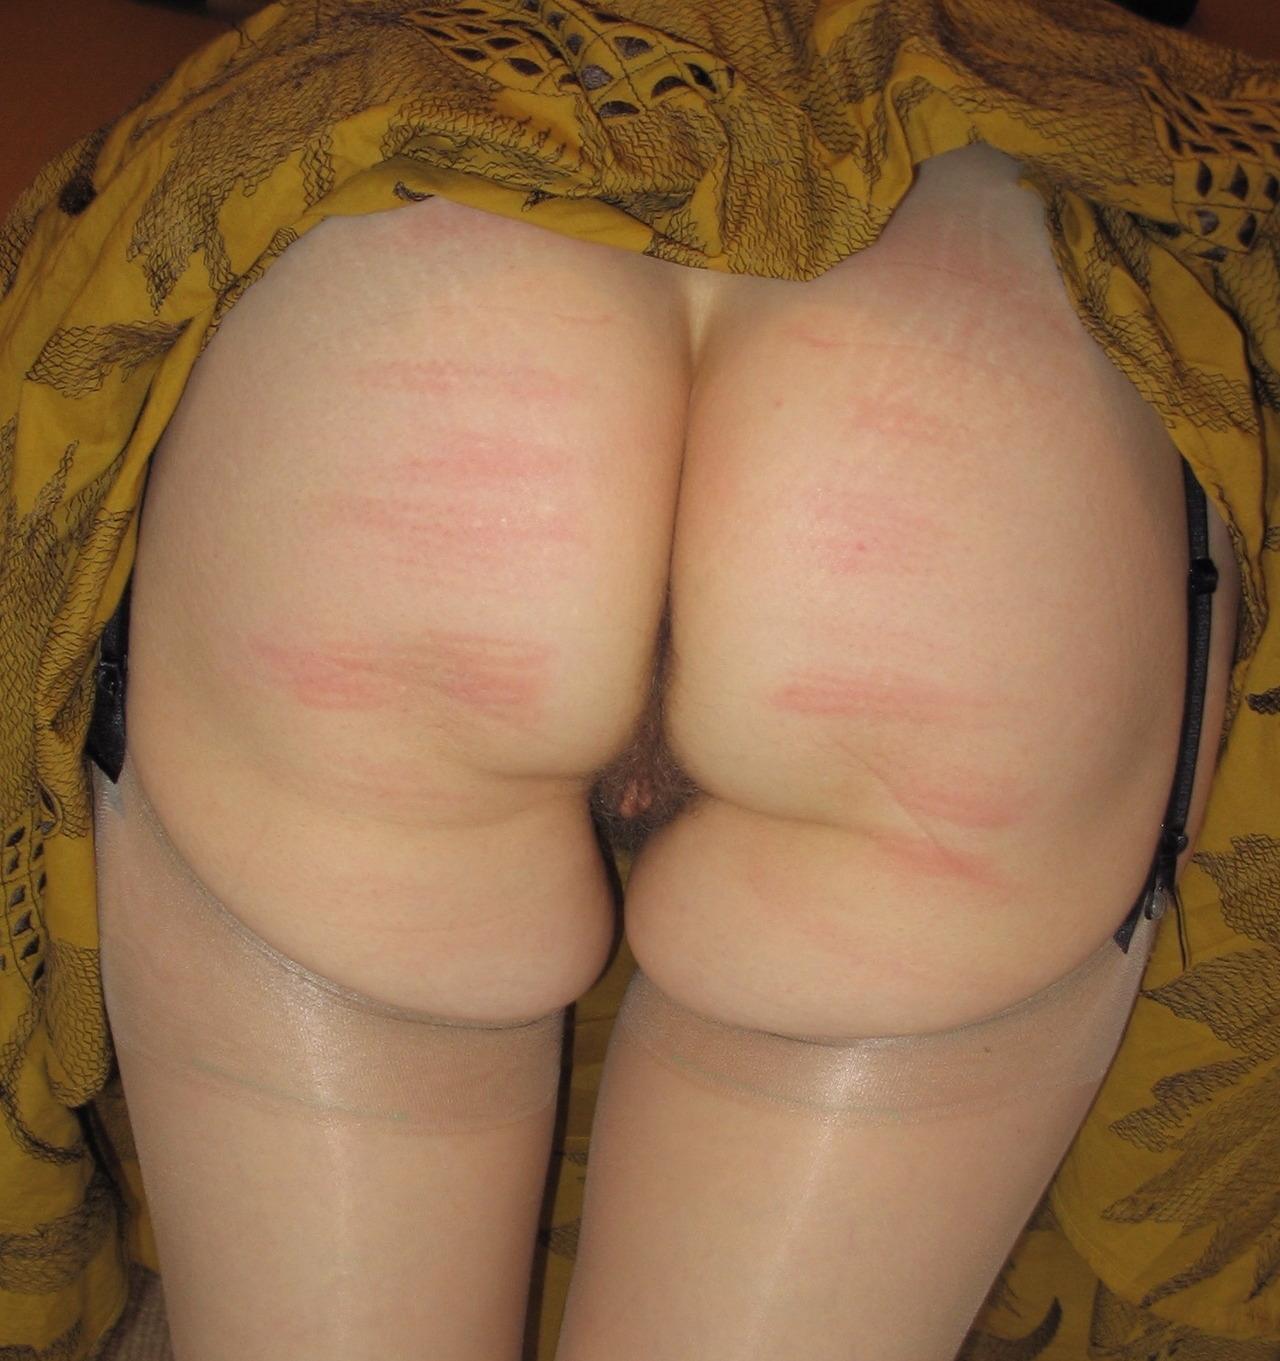 tumblr bare bottom spanking and panty